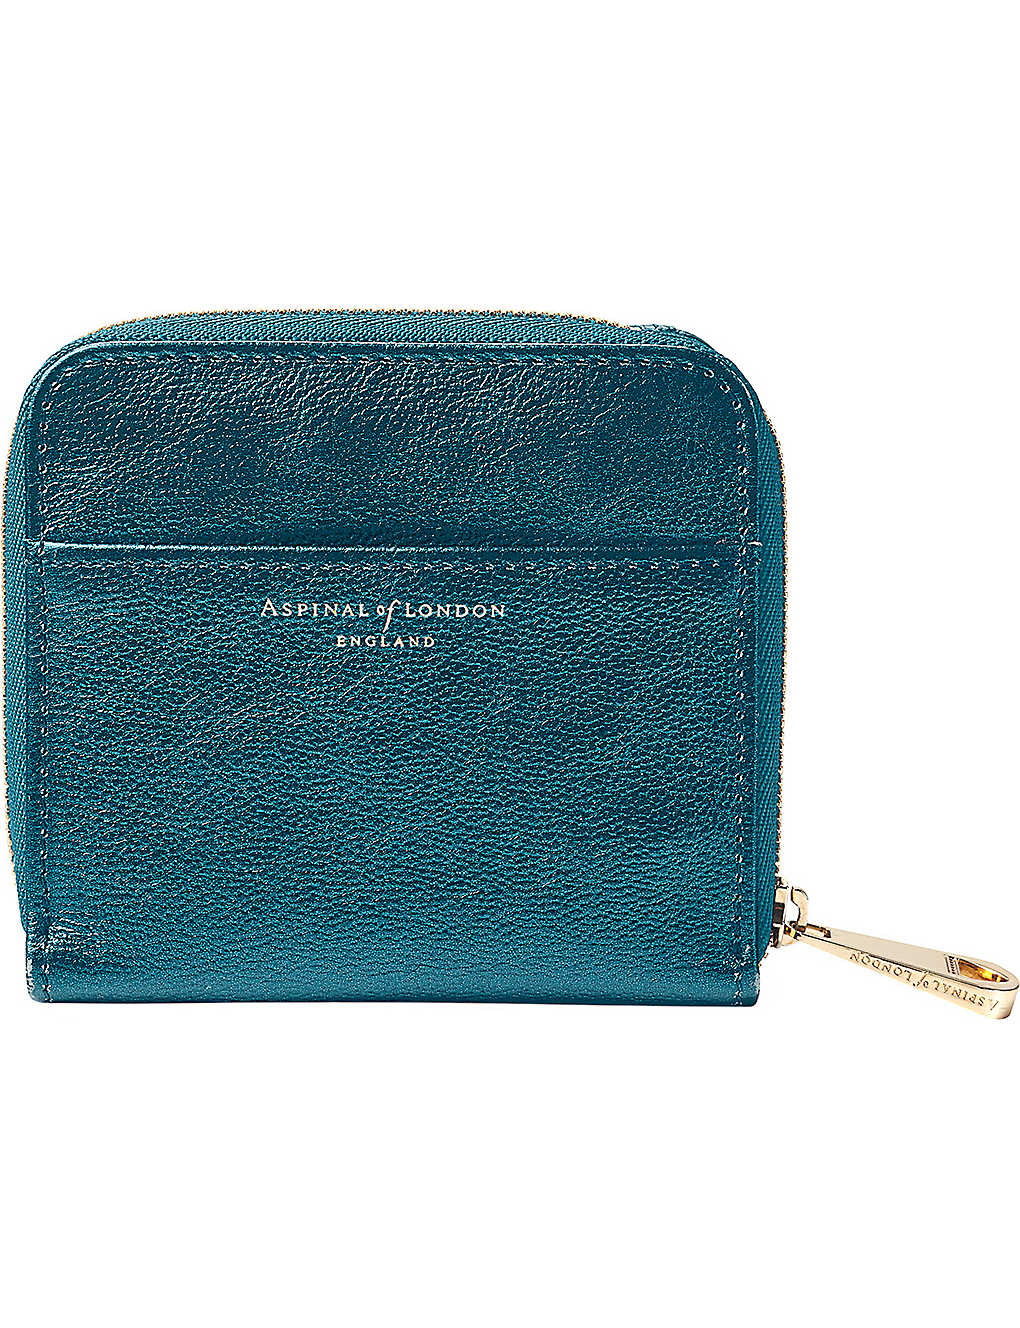 b224b12e218d ASPINAL OF LONDON - Mini continental metallic-leather coin purse ...